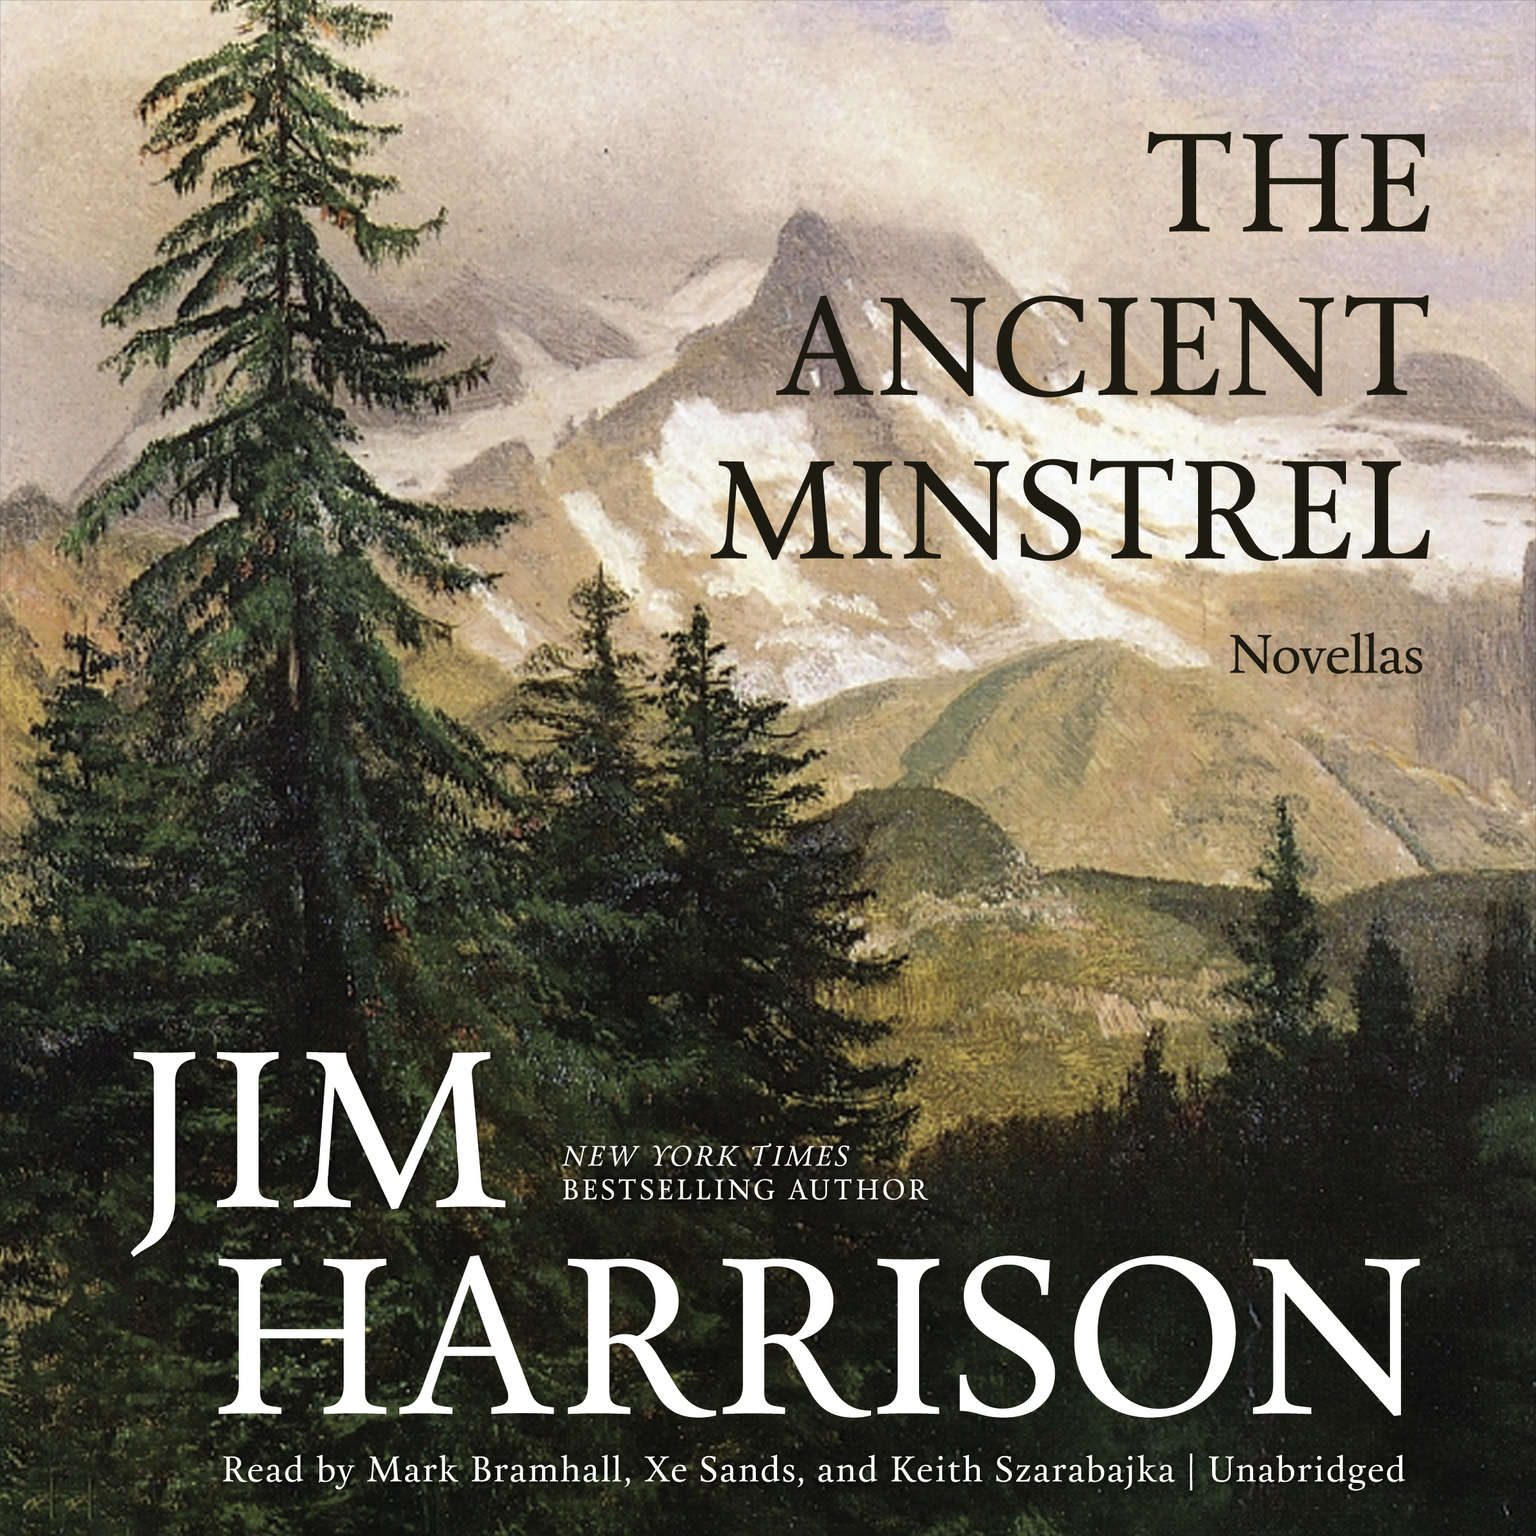 The Ancient Minstrel: Novellas Audiobook, by Jim Harrison